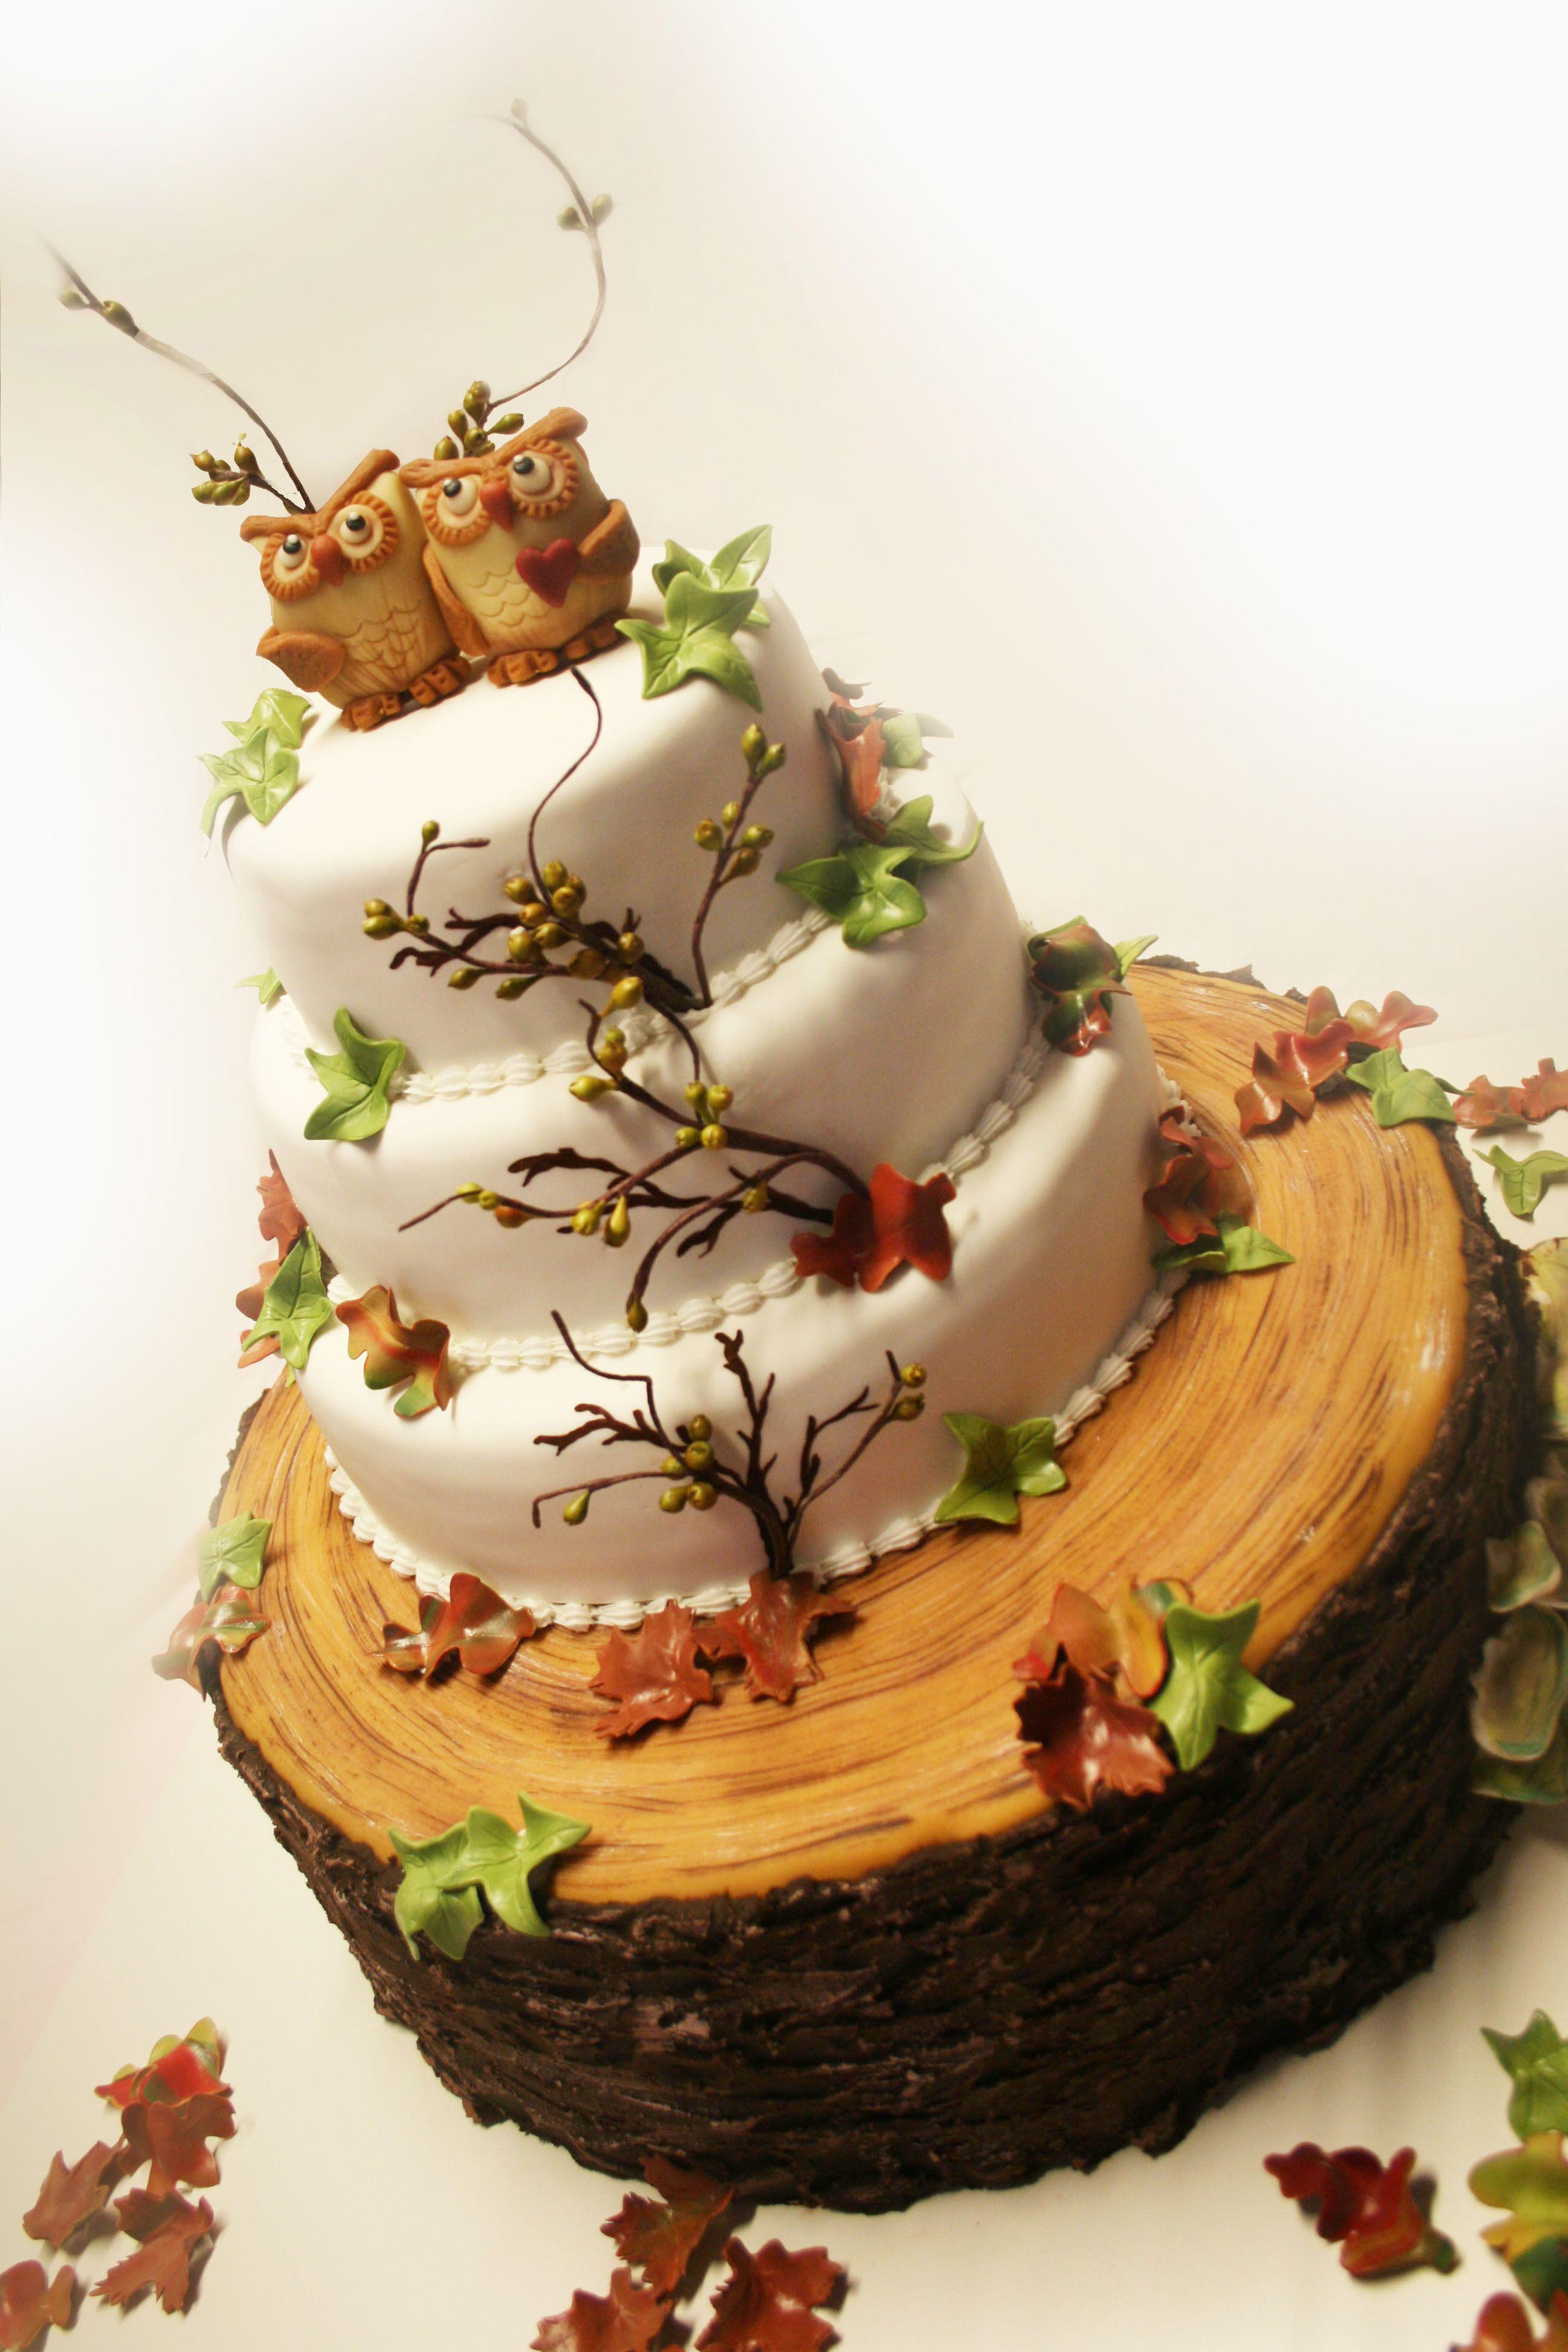 Autumn wedding cake Great 5 tier autumn wedding cake